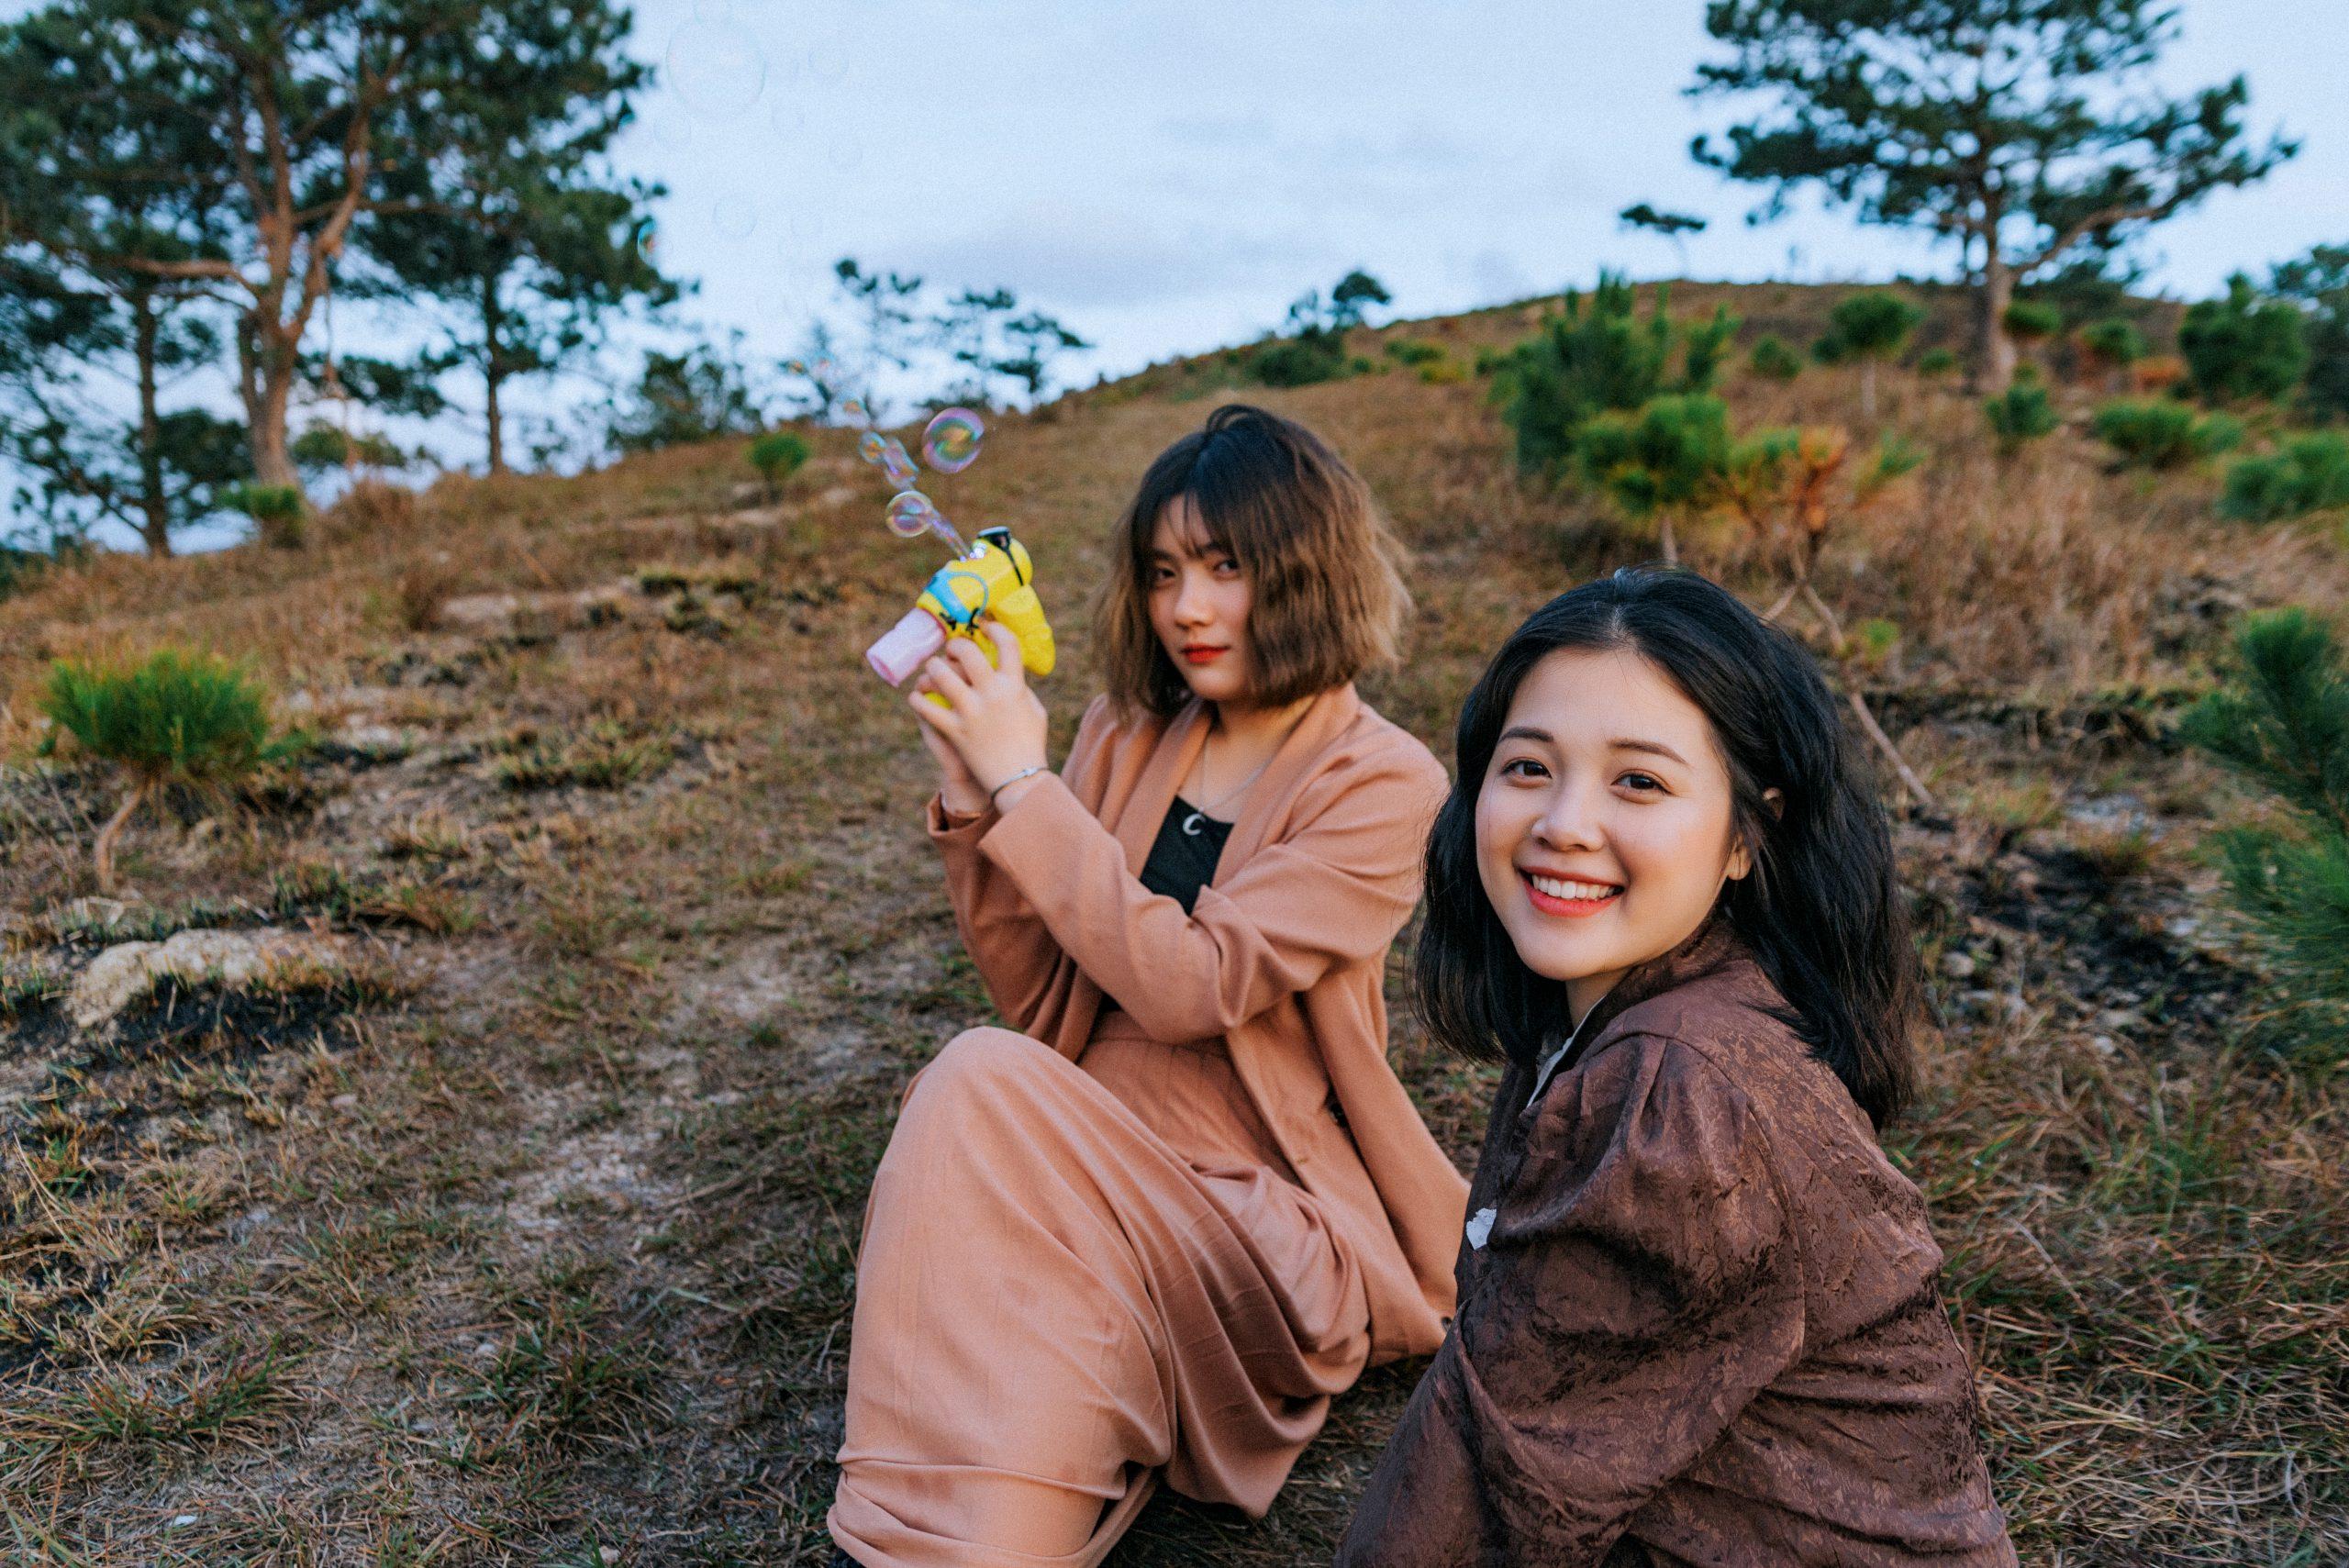 Photo of women sitting on grass